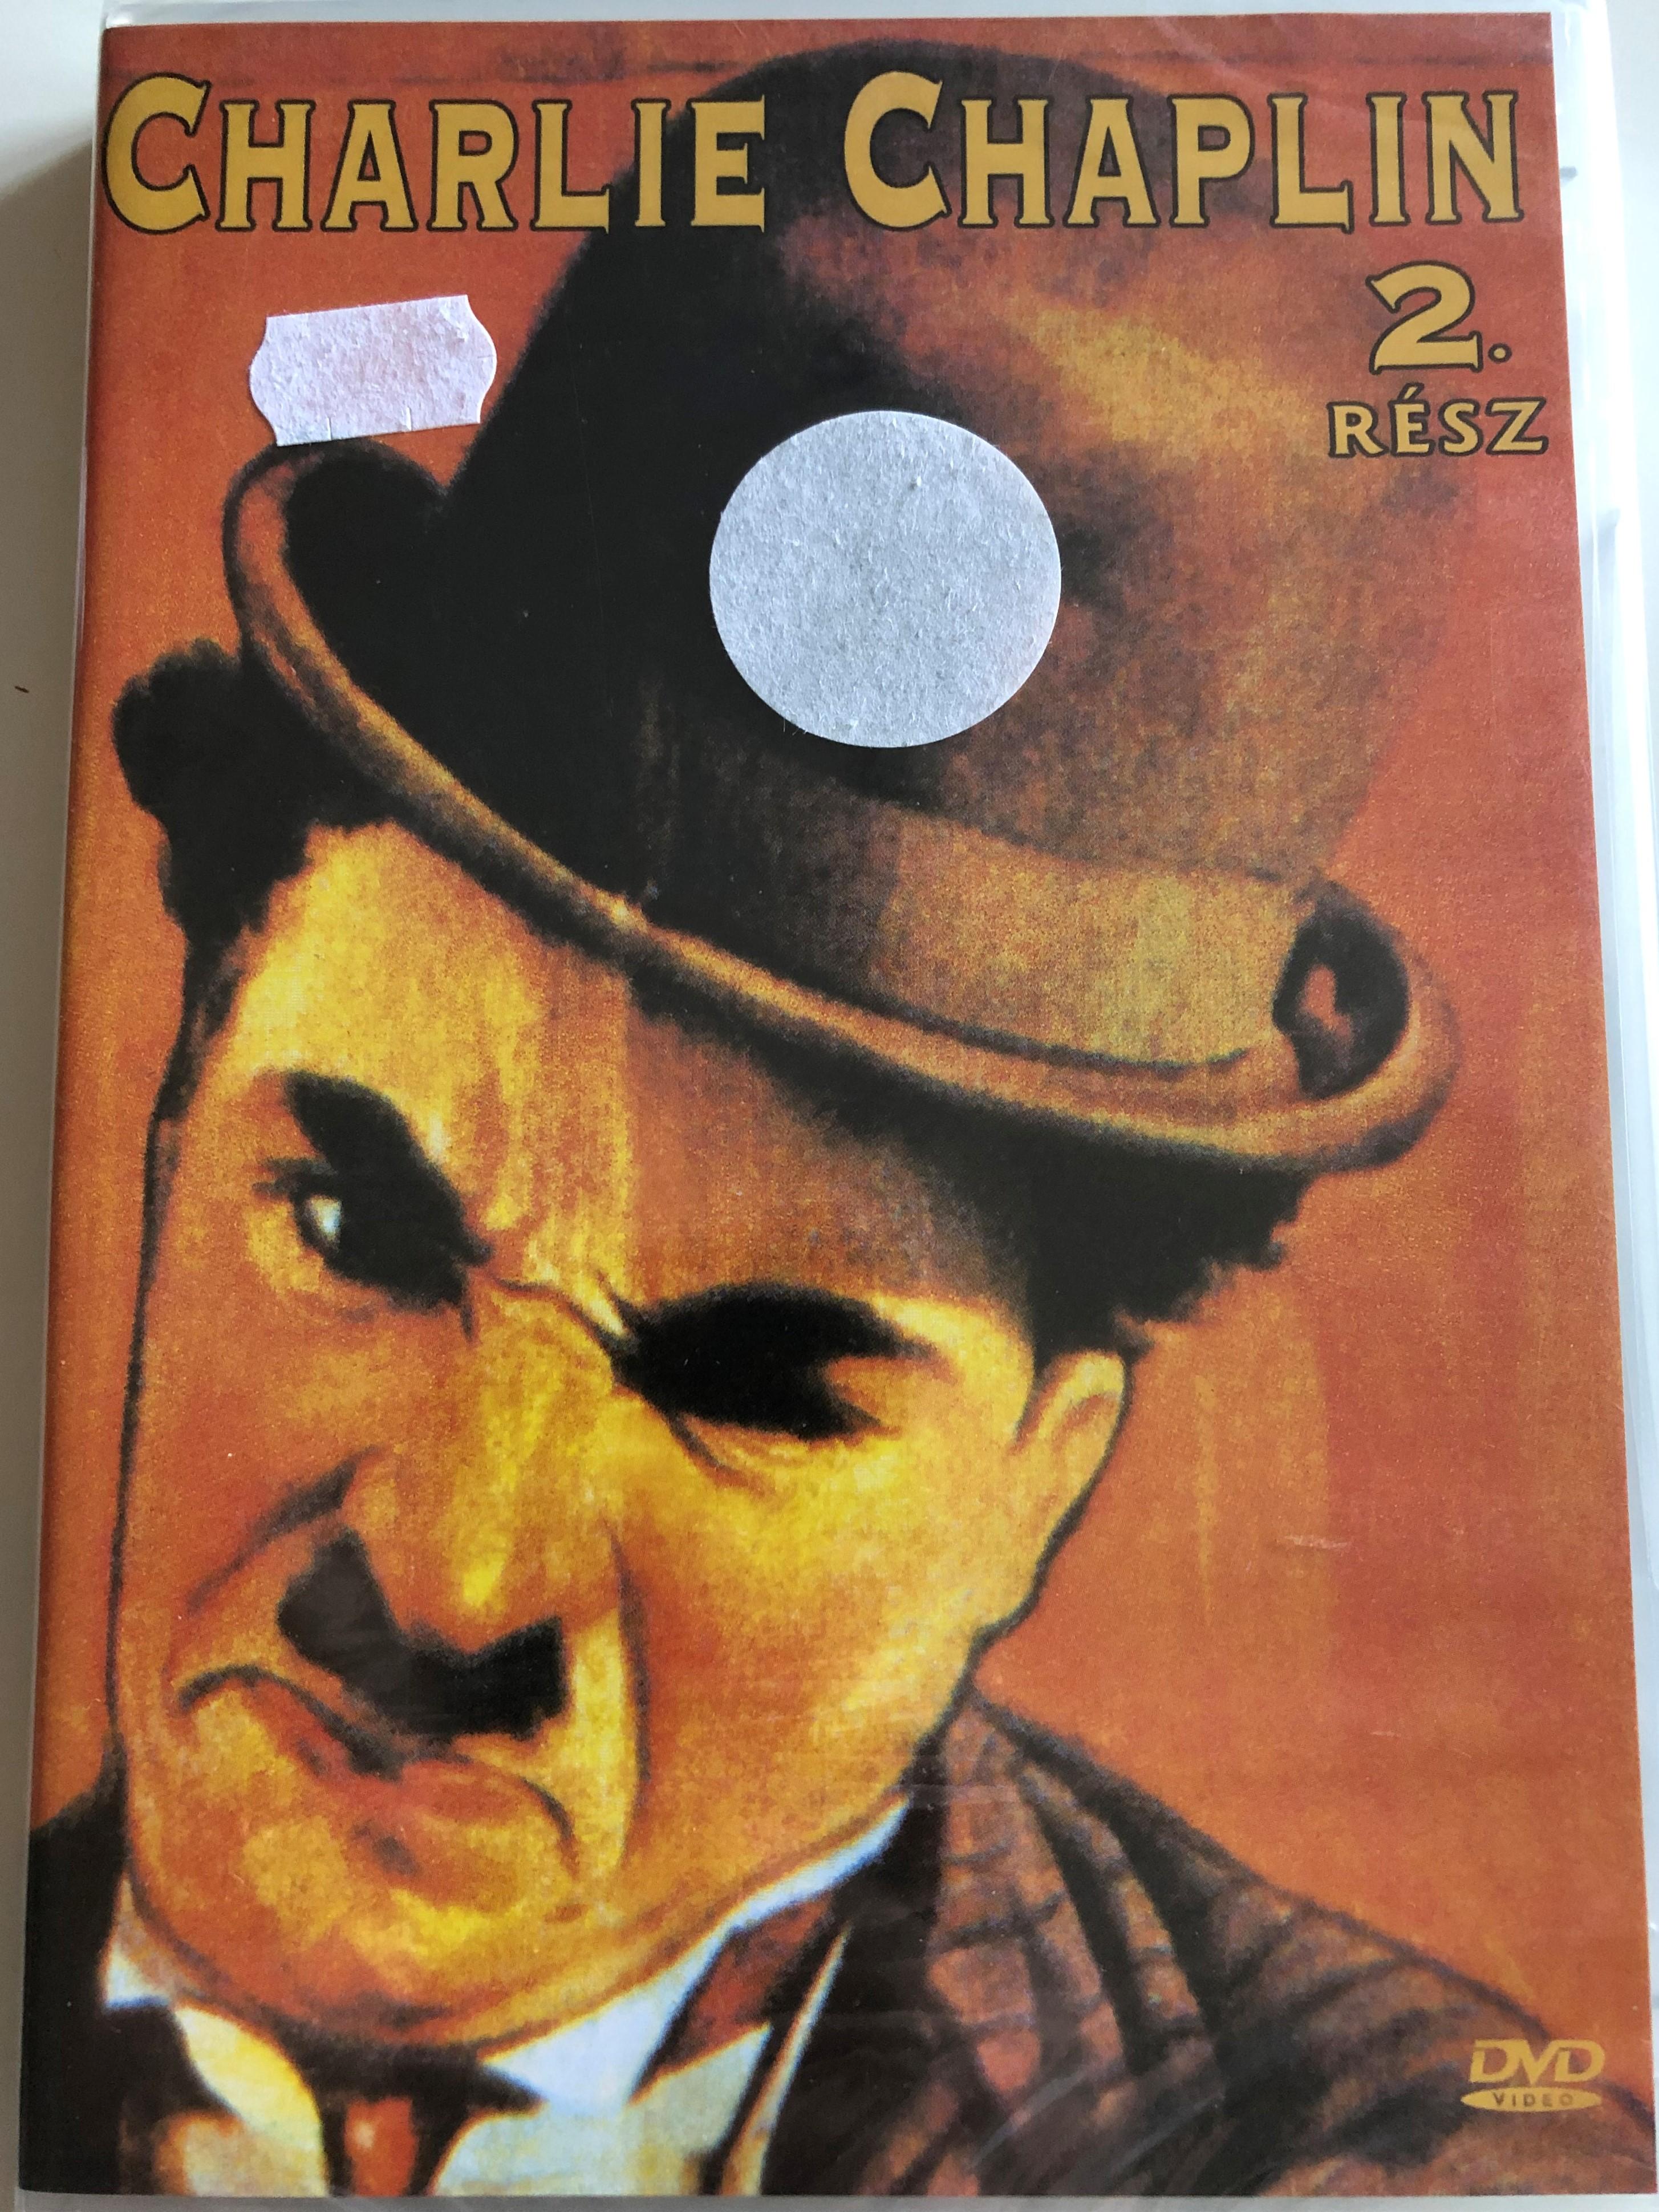 charlie-chaplin-2-r-sz.-dvd-2005-charlie-chaplin-part-2.-1.jpg